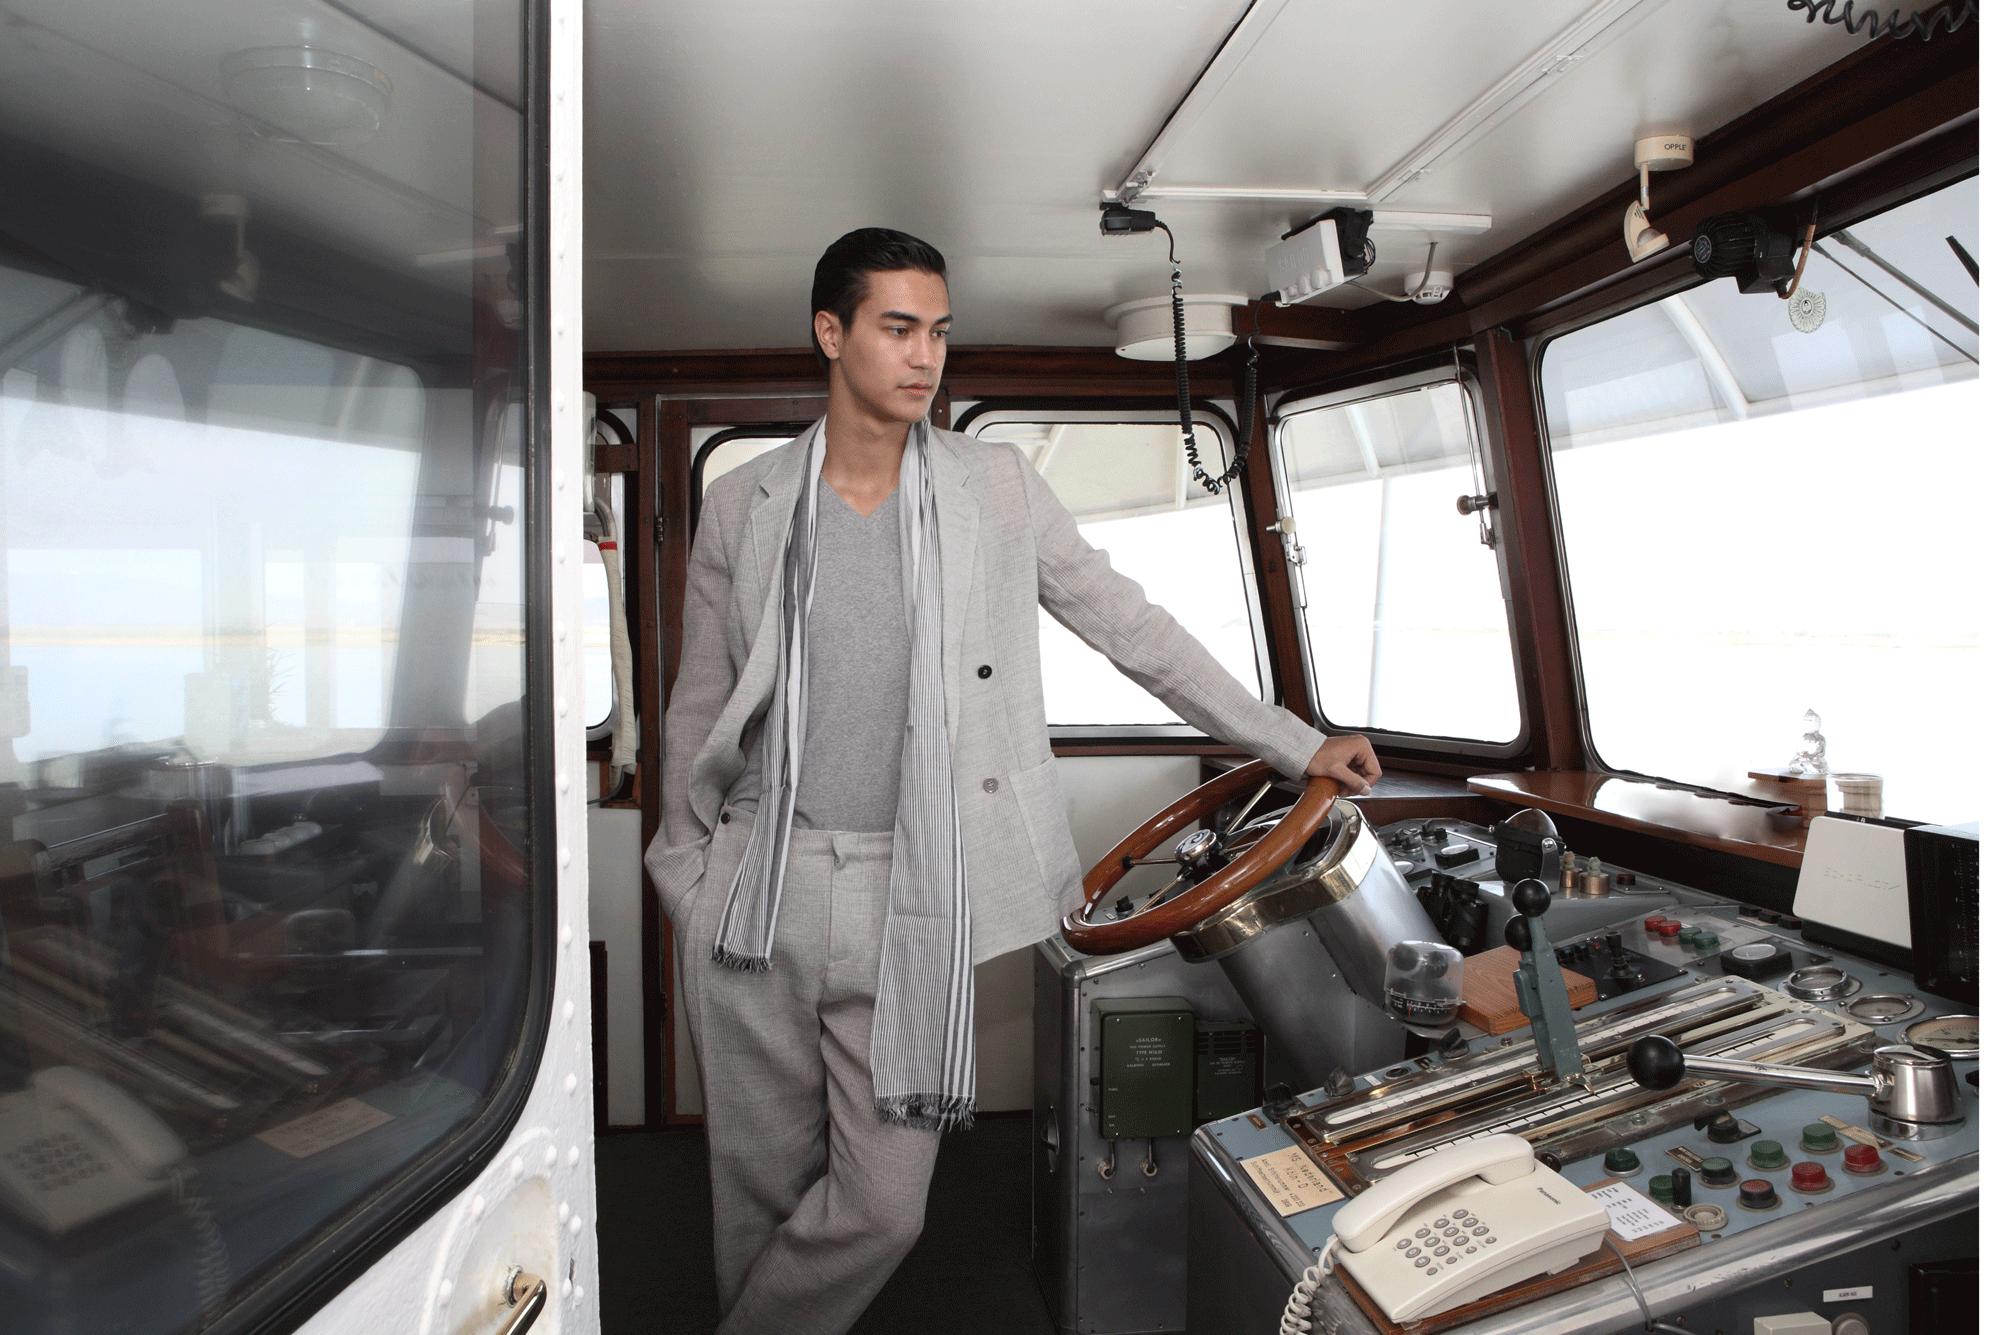 suit : Emporio Armani / tshirt : JOCKEY